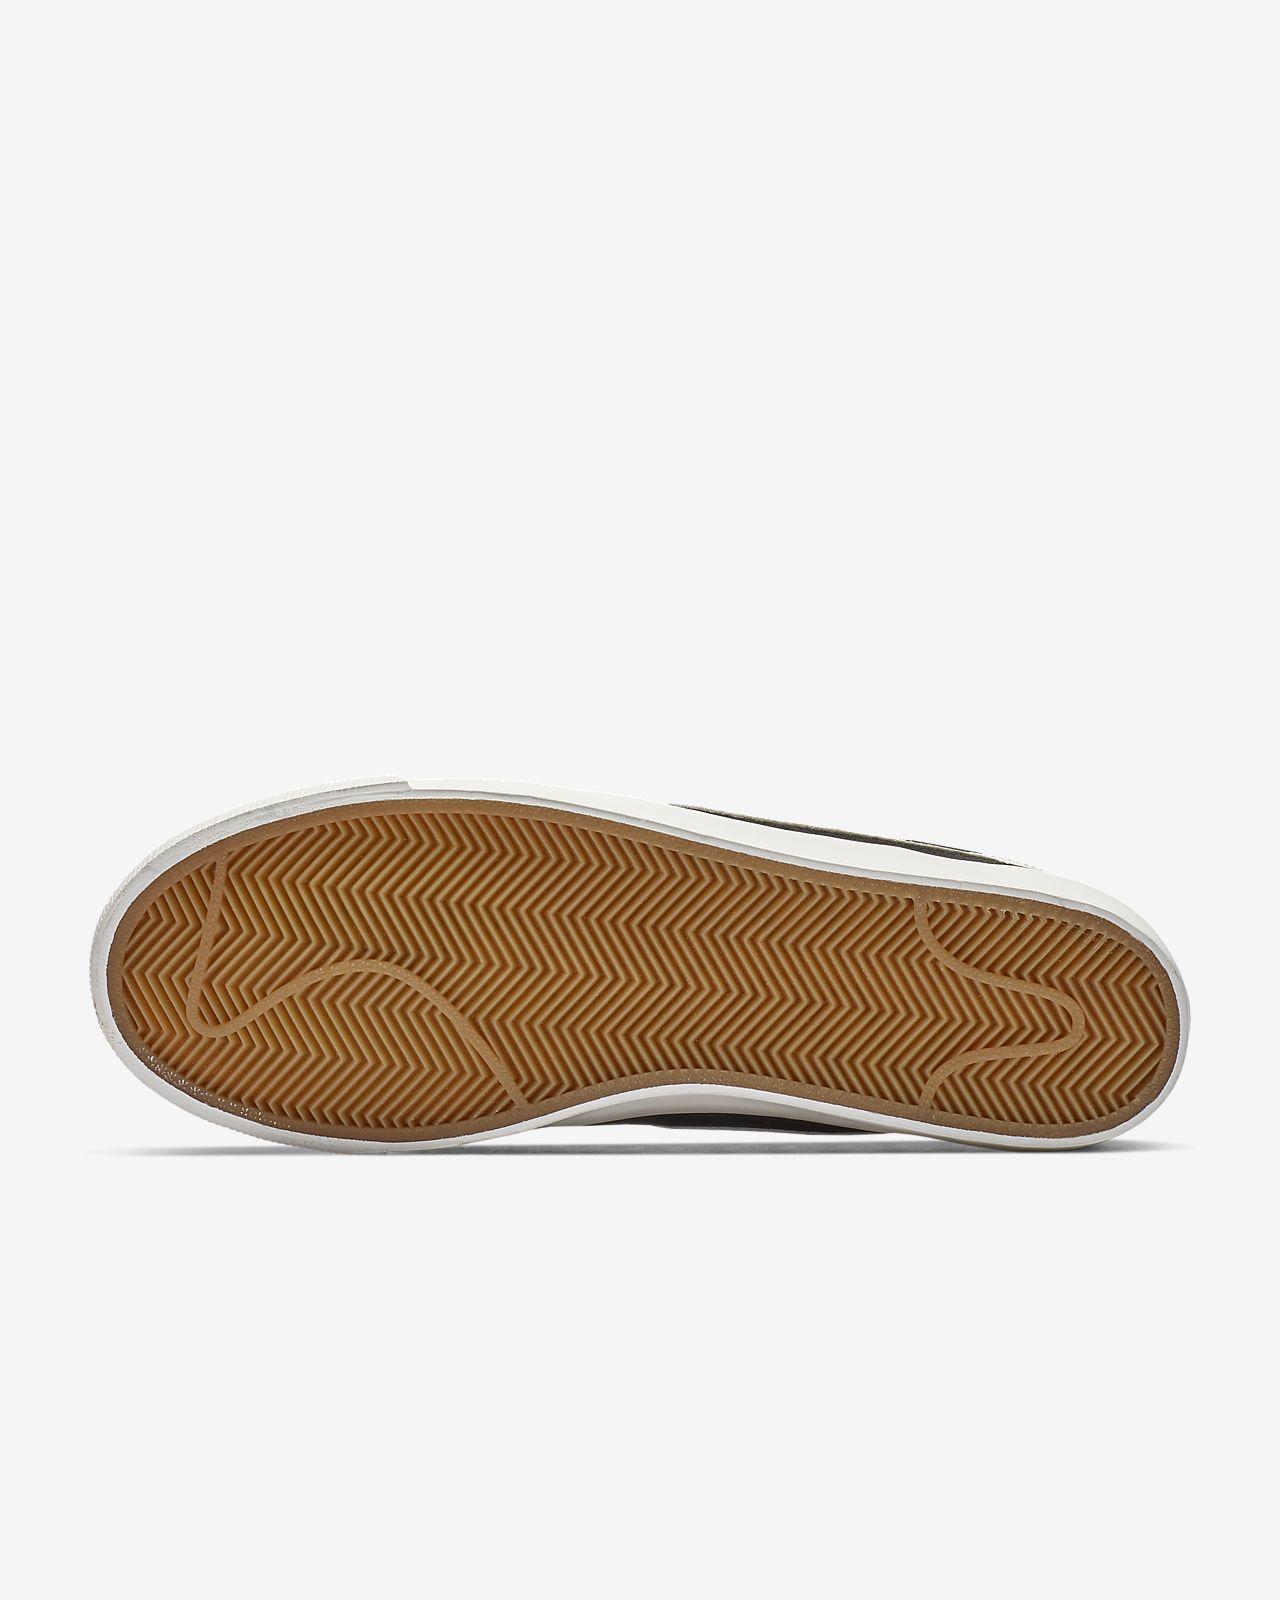 aace2da6 Nike SB Blazer Low GT Skate Shoe. Nike.com GB